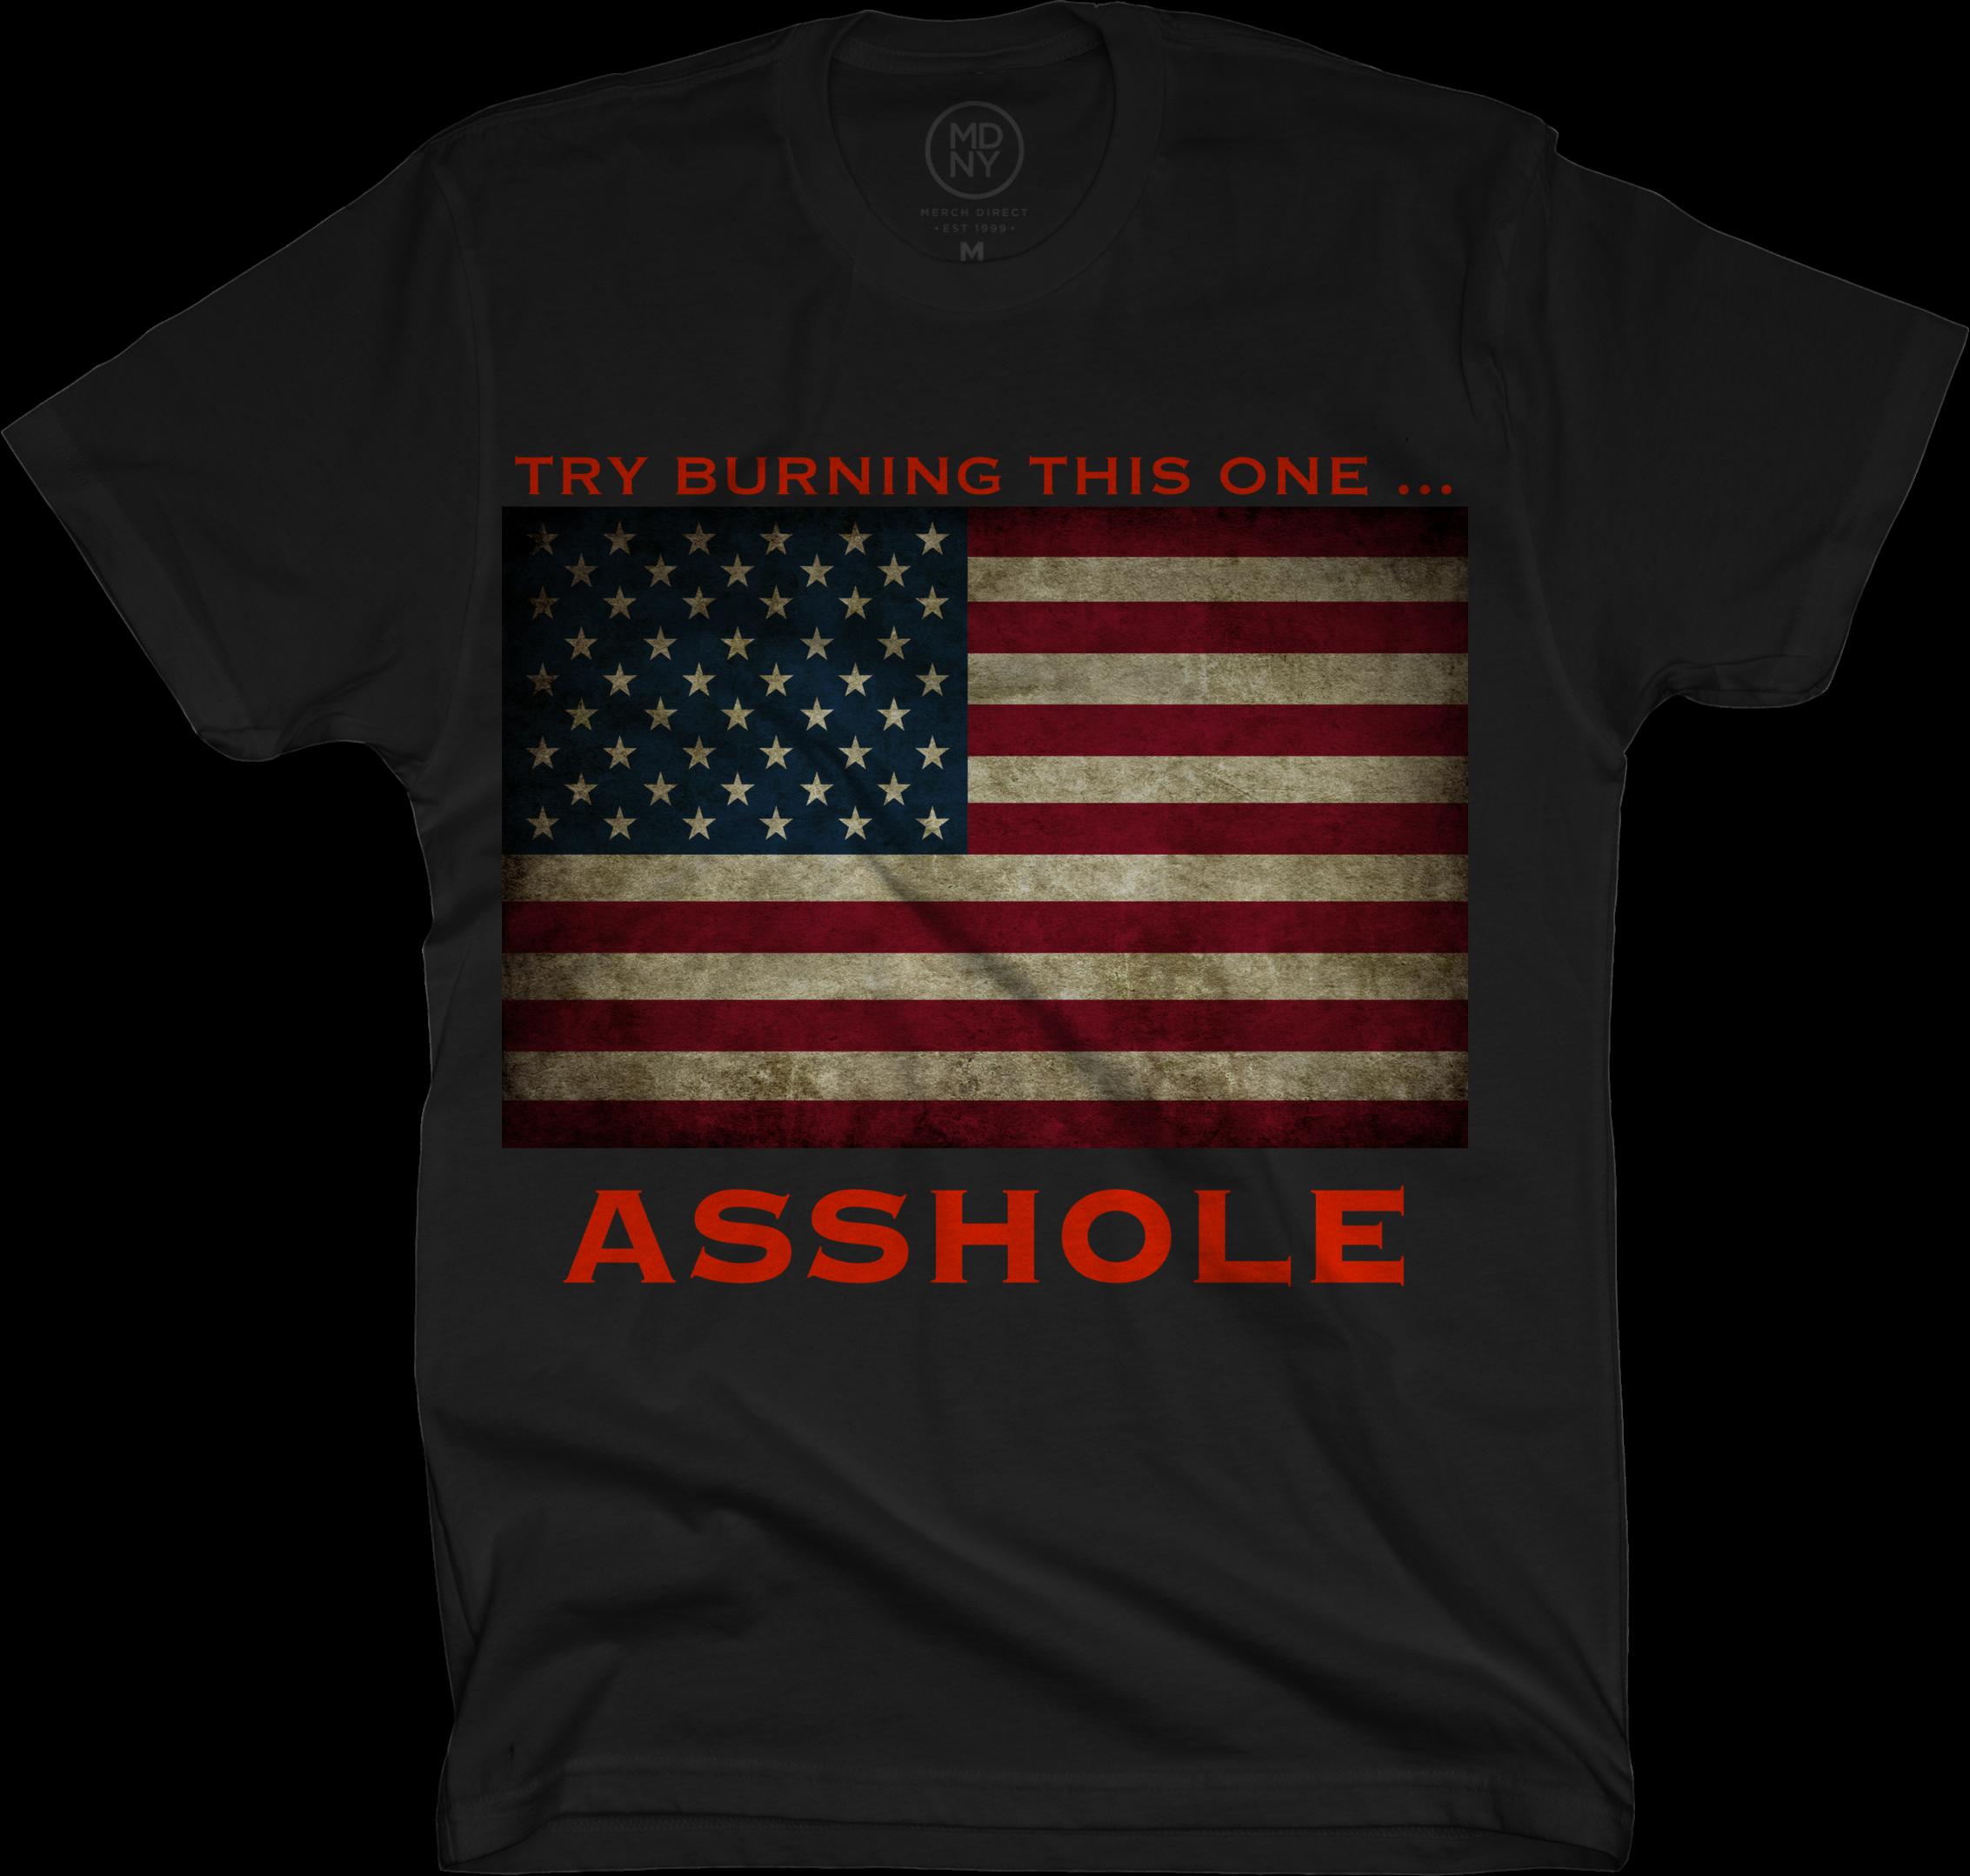 Burning ass hole